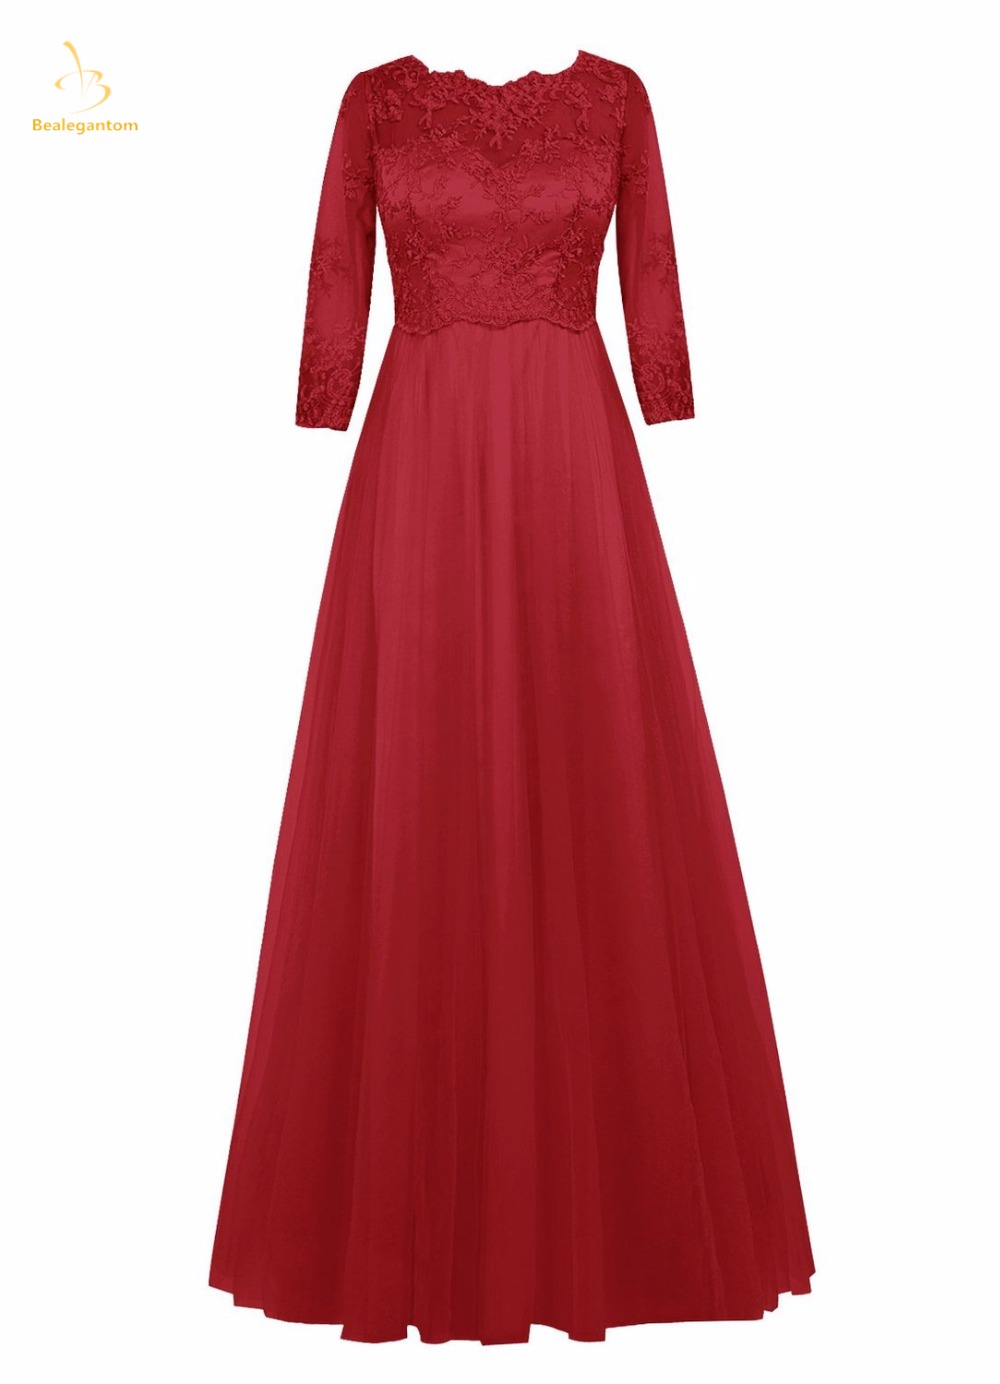 Bealegantom 2019 New A-Line Chiffon   Prom     Dresses   Beaded Plus Size Formal Evening Party Gowns Vestido Longo QA1444